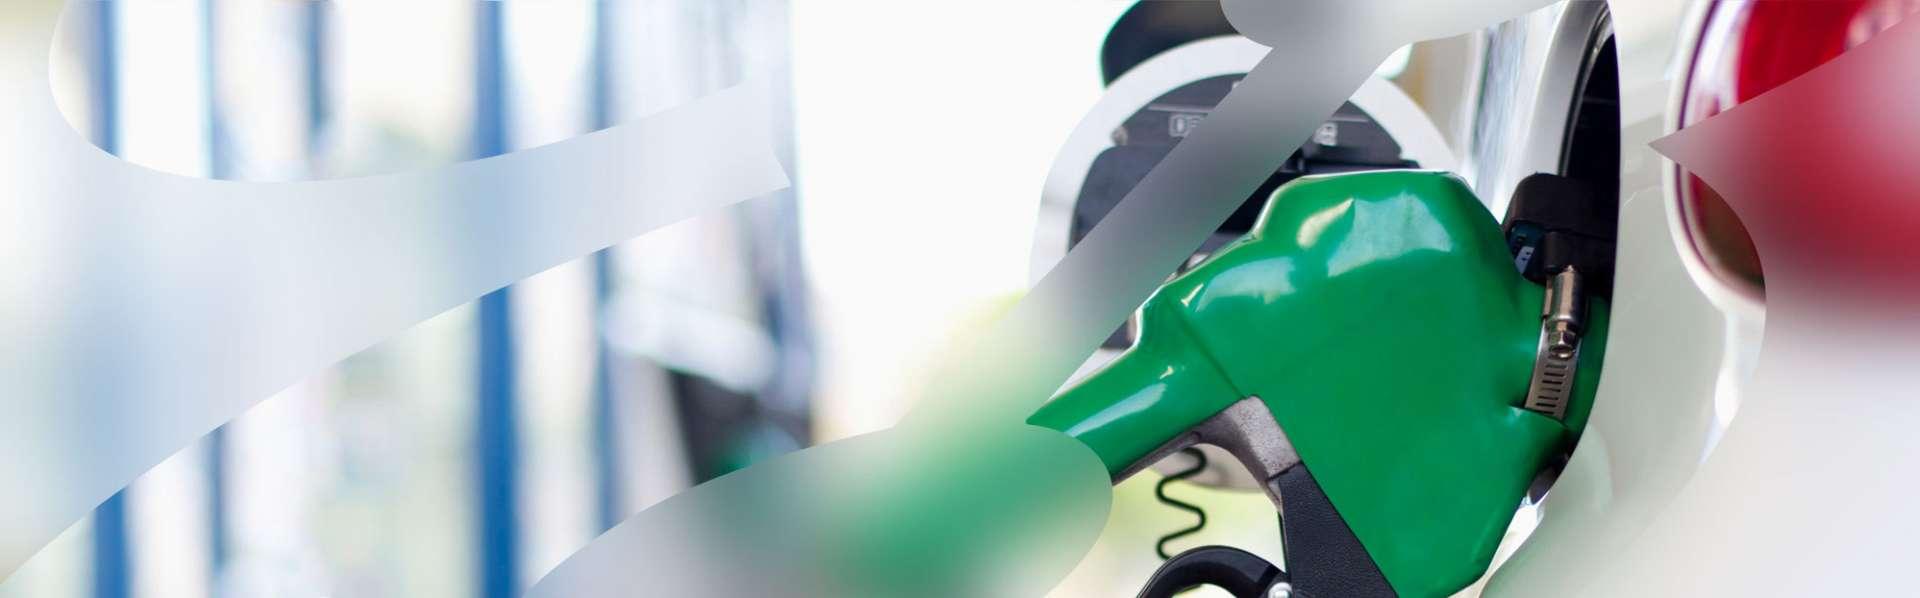 Antioxidants for Fuel & Lubricants